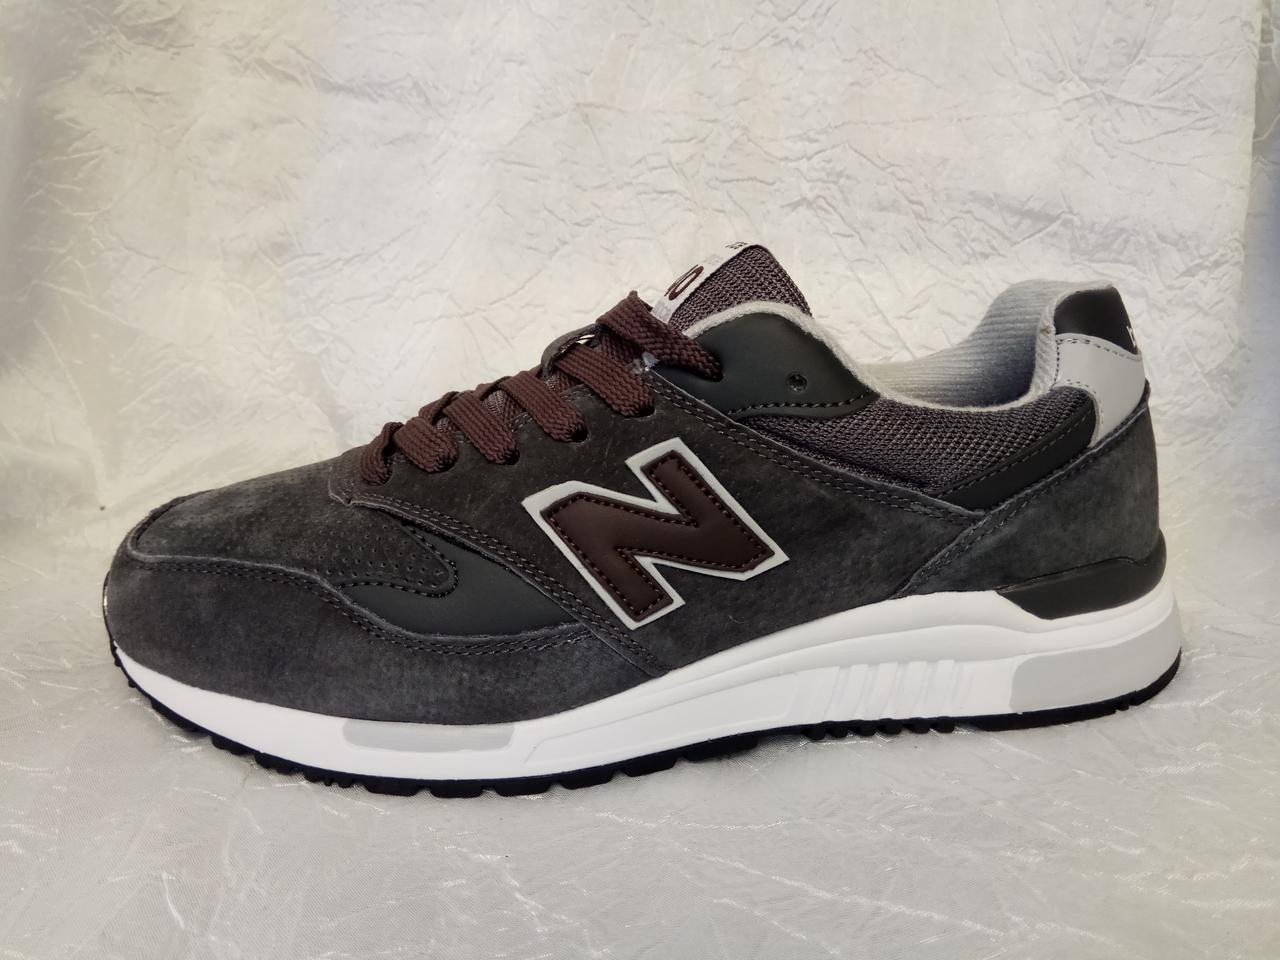 bff700aa2824d5 Мужские кроссовки New Balance 840 серые , размеры с 41 по 45 - Интернет  магазин krossovkiweb